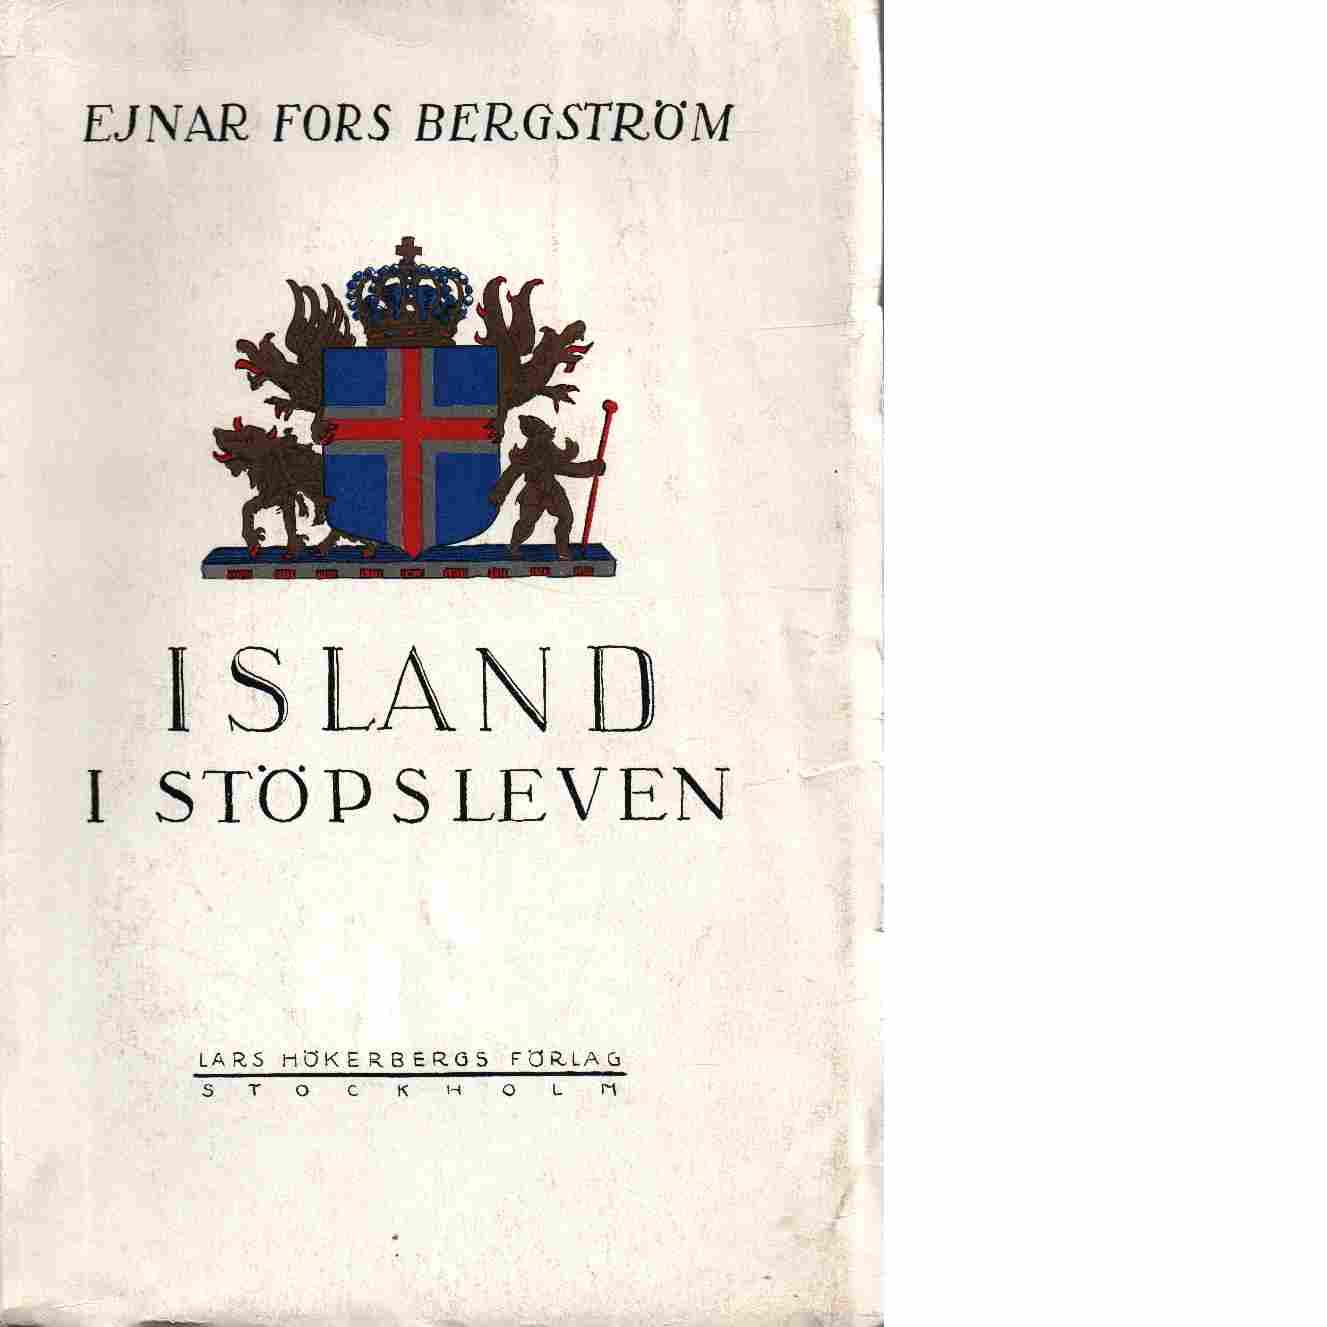 Island i stöpsleven - Bergström, Ejnar Fors